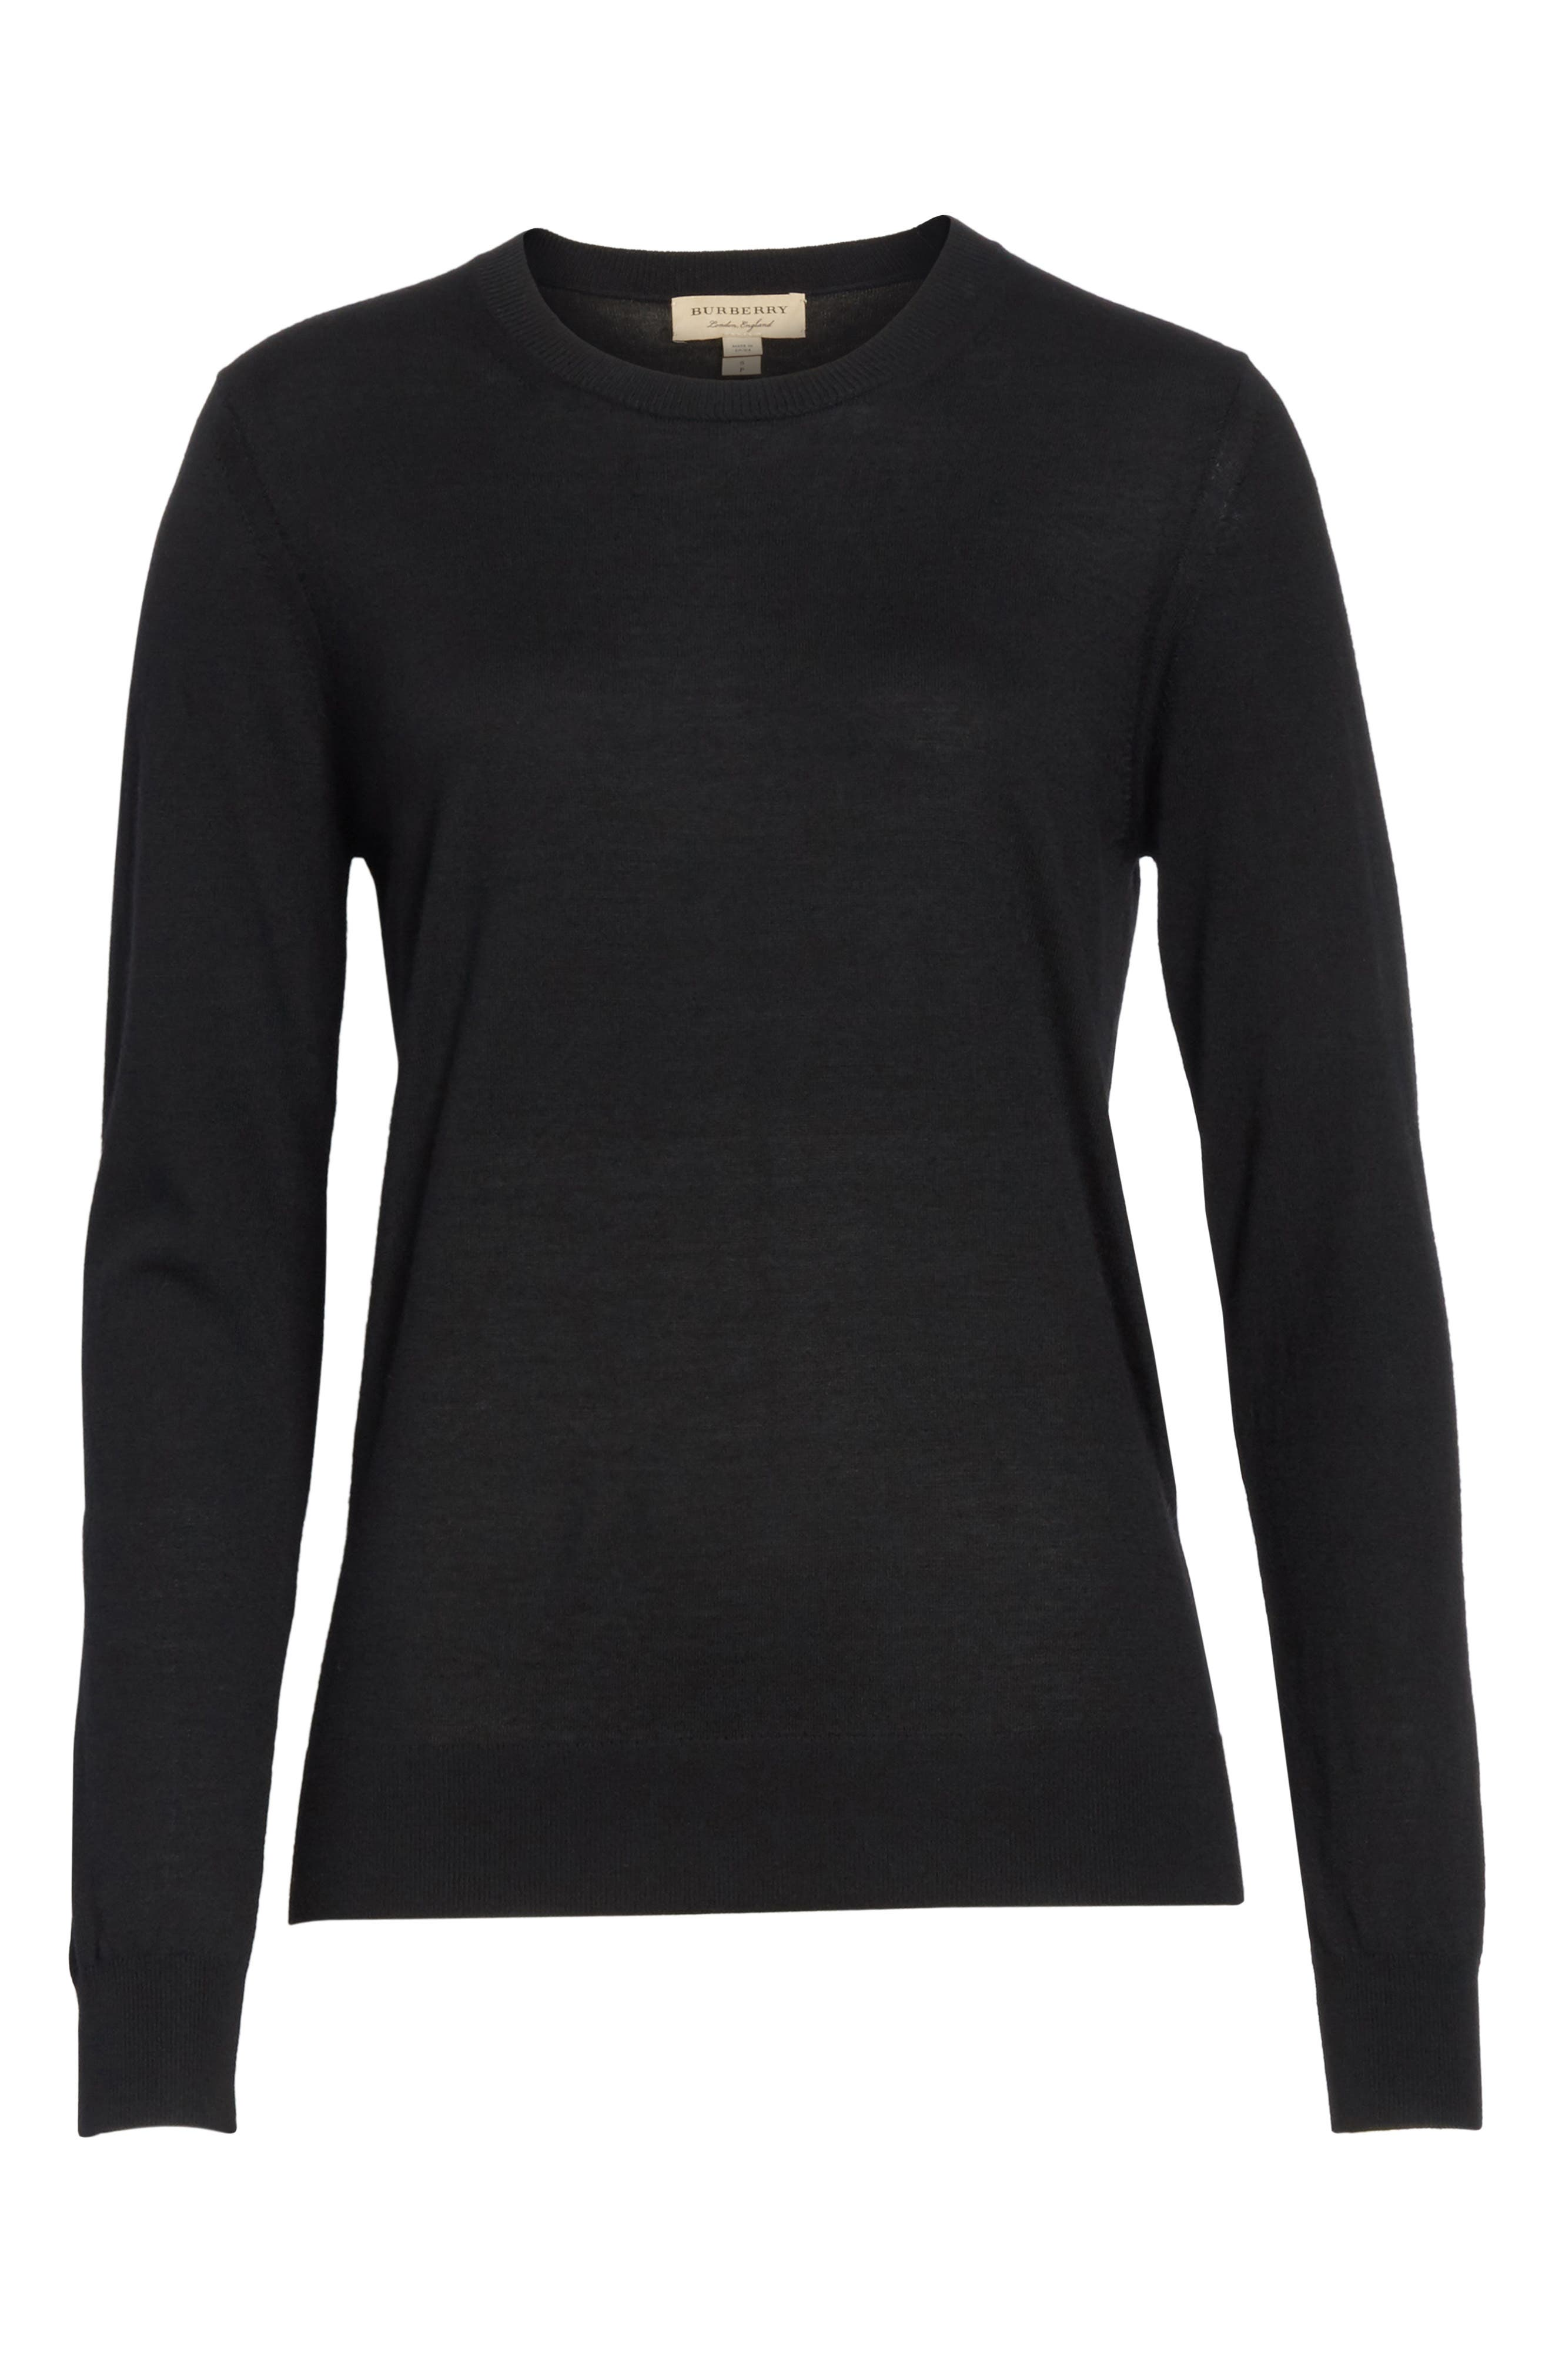 BURBERRY,                             Viar Merino Wool Sweater,                             Alternate thumbnail 6, color,                             001